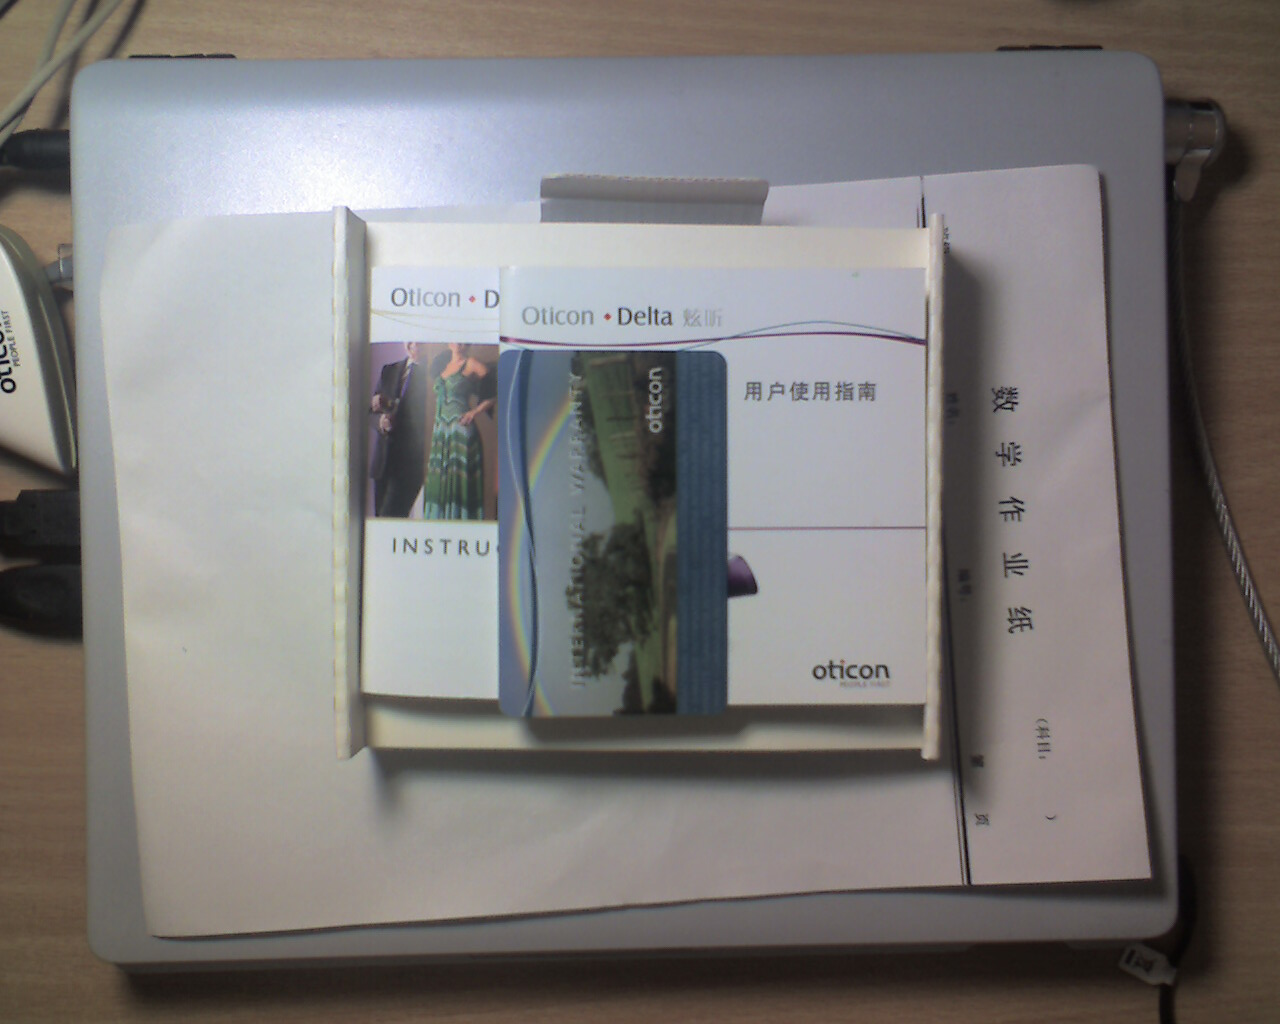 Otion Delta 中英文使用说明, 全球联保卡